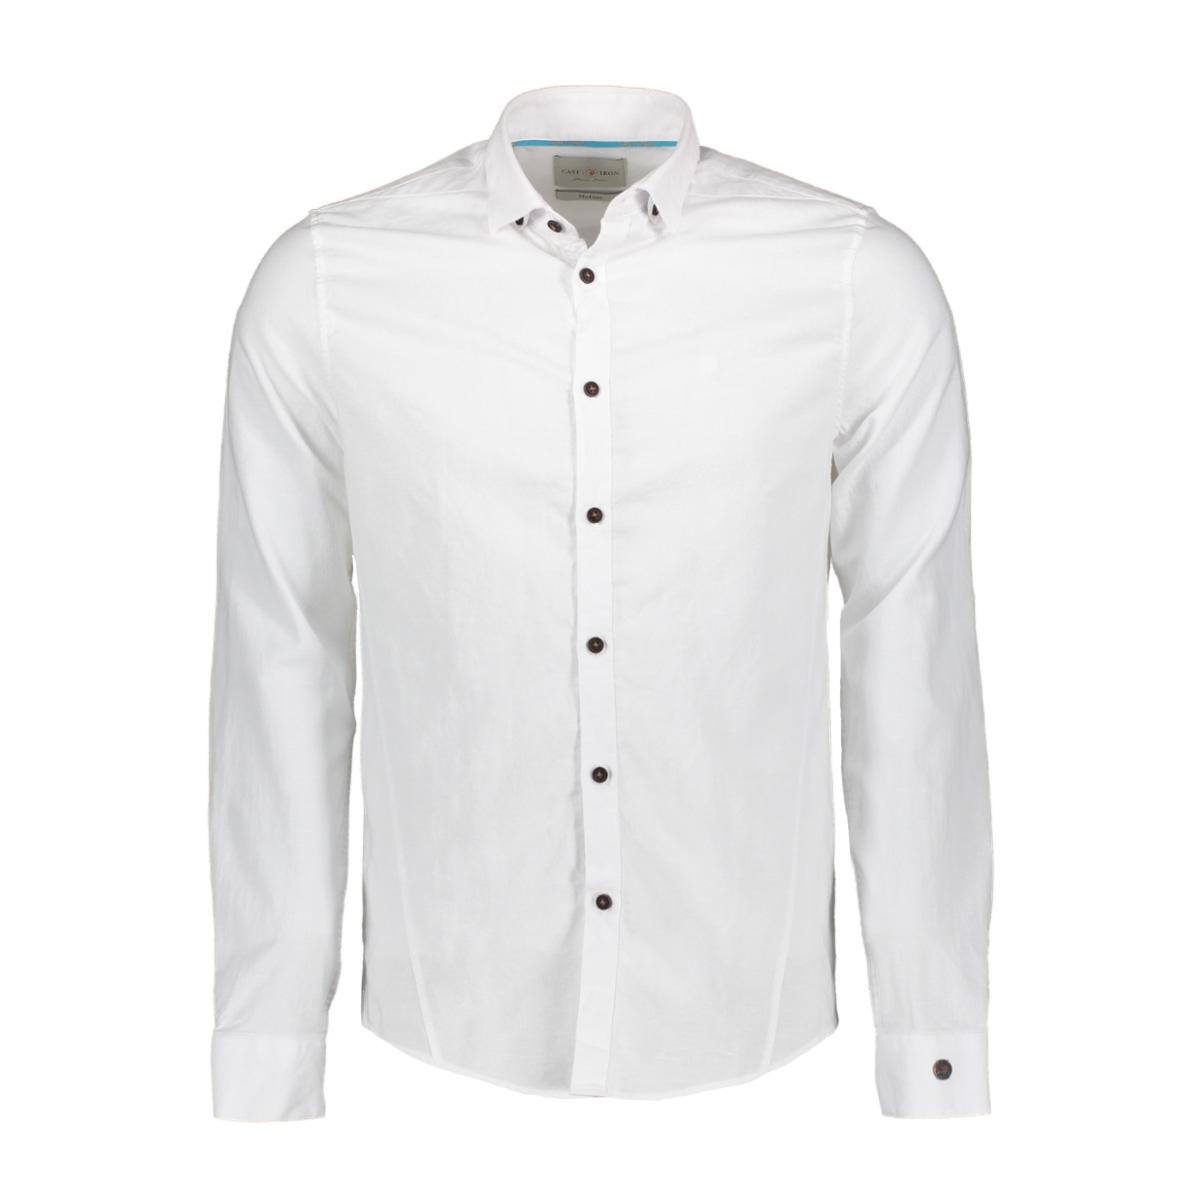 cotton linnen dobby shirt csi193642 cast iron overhemd 7003